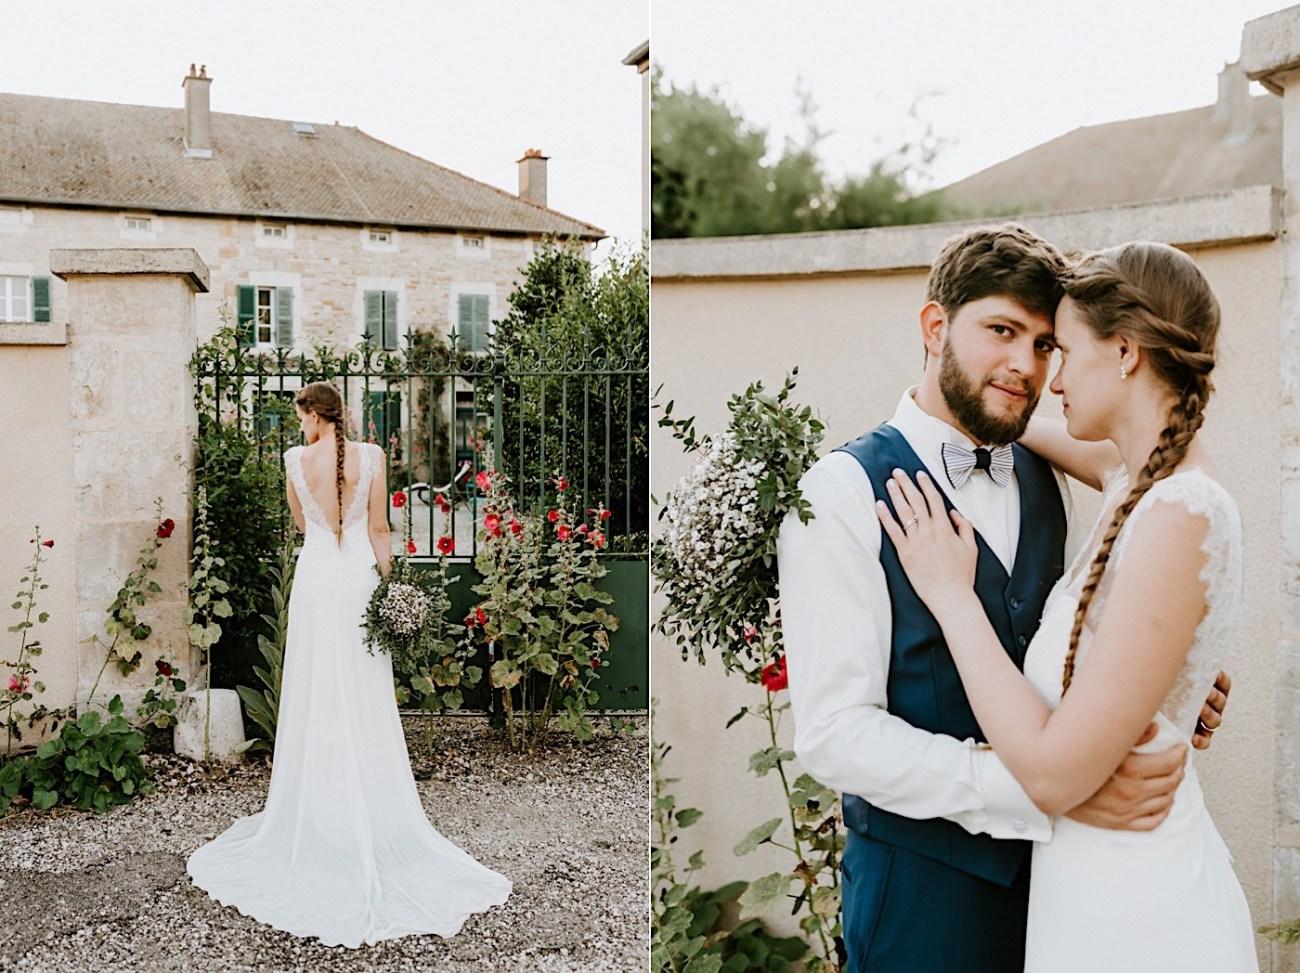 French Rural Wedding After Wedding Day Photos Paris Wedding Photographer 015